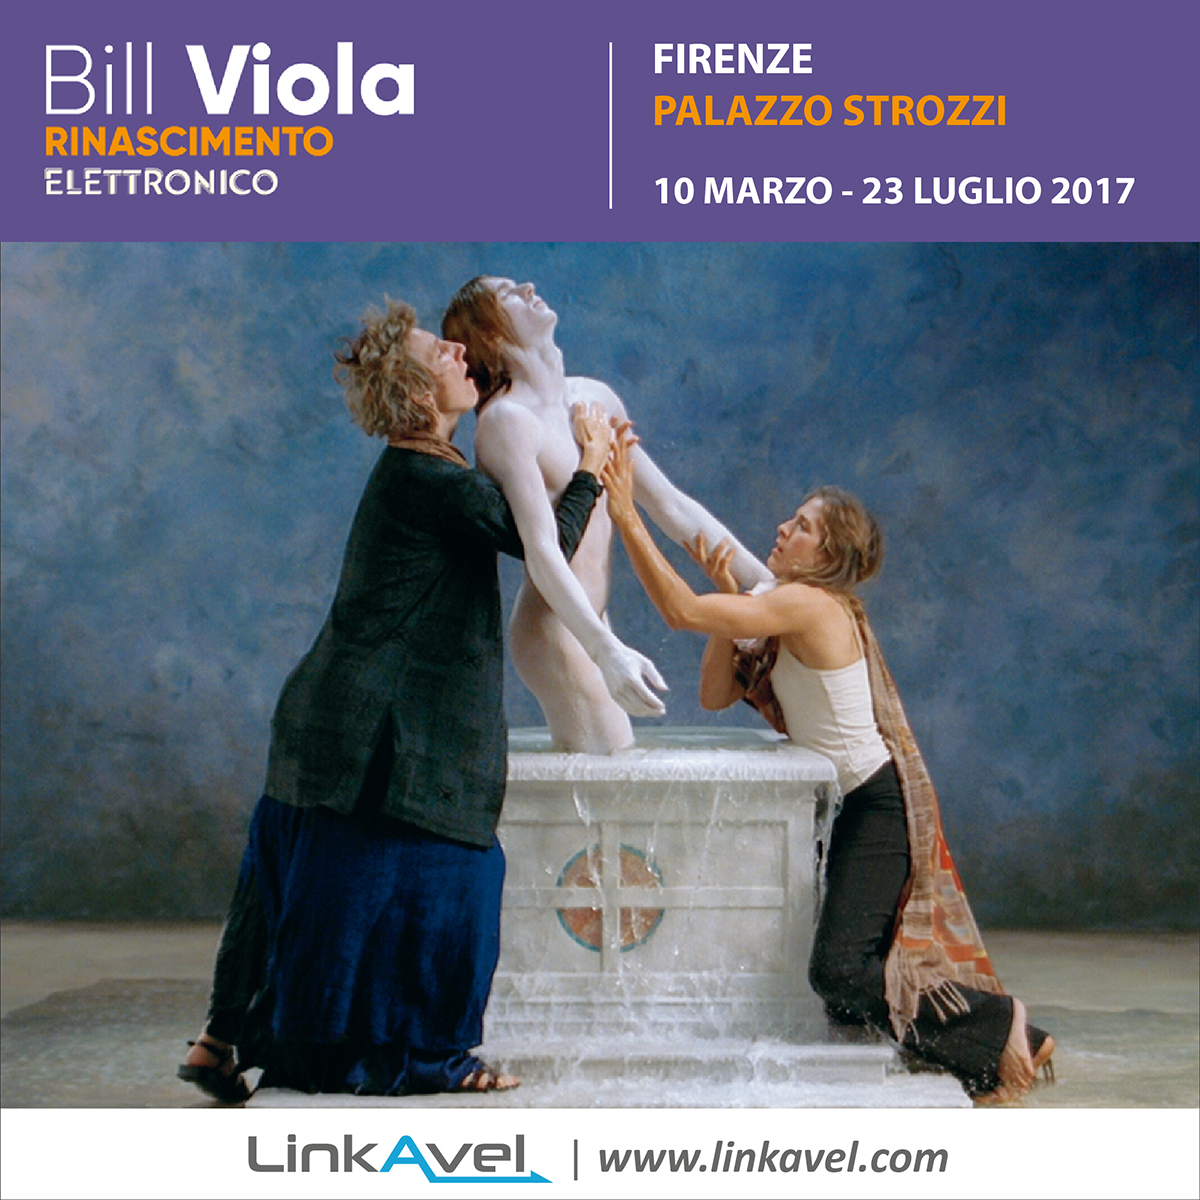 Mostra Bill Viola a Palazzo Strozzi, Firenze